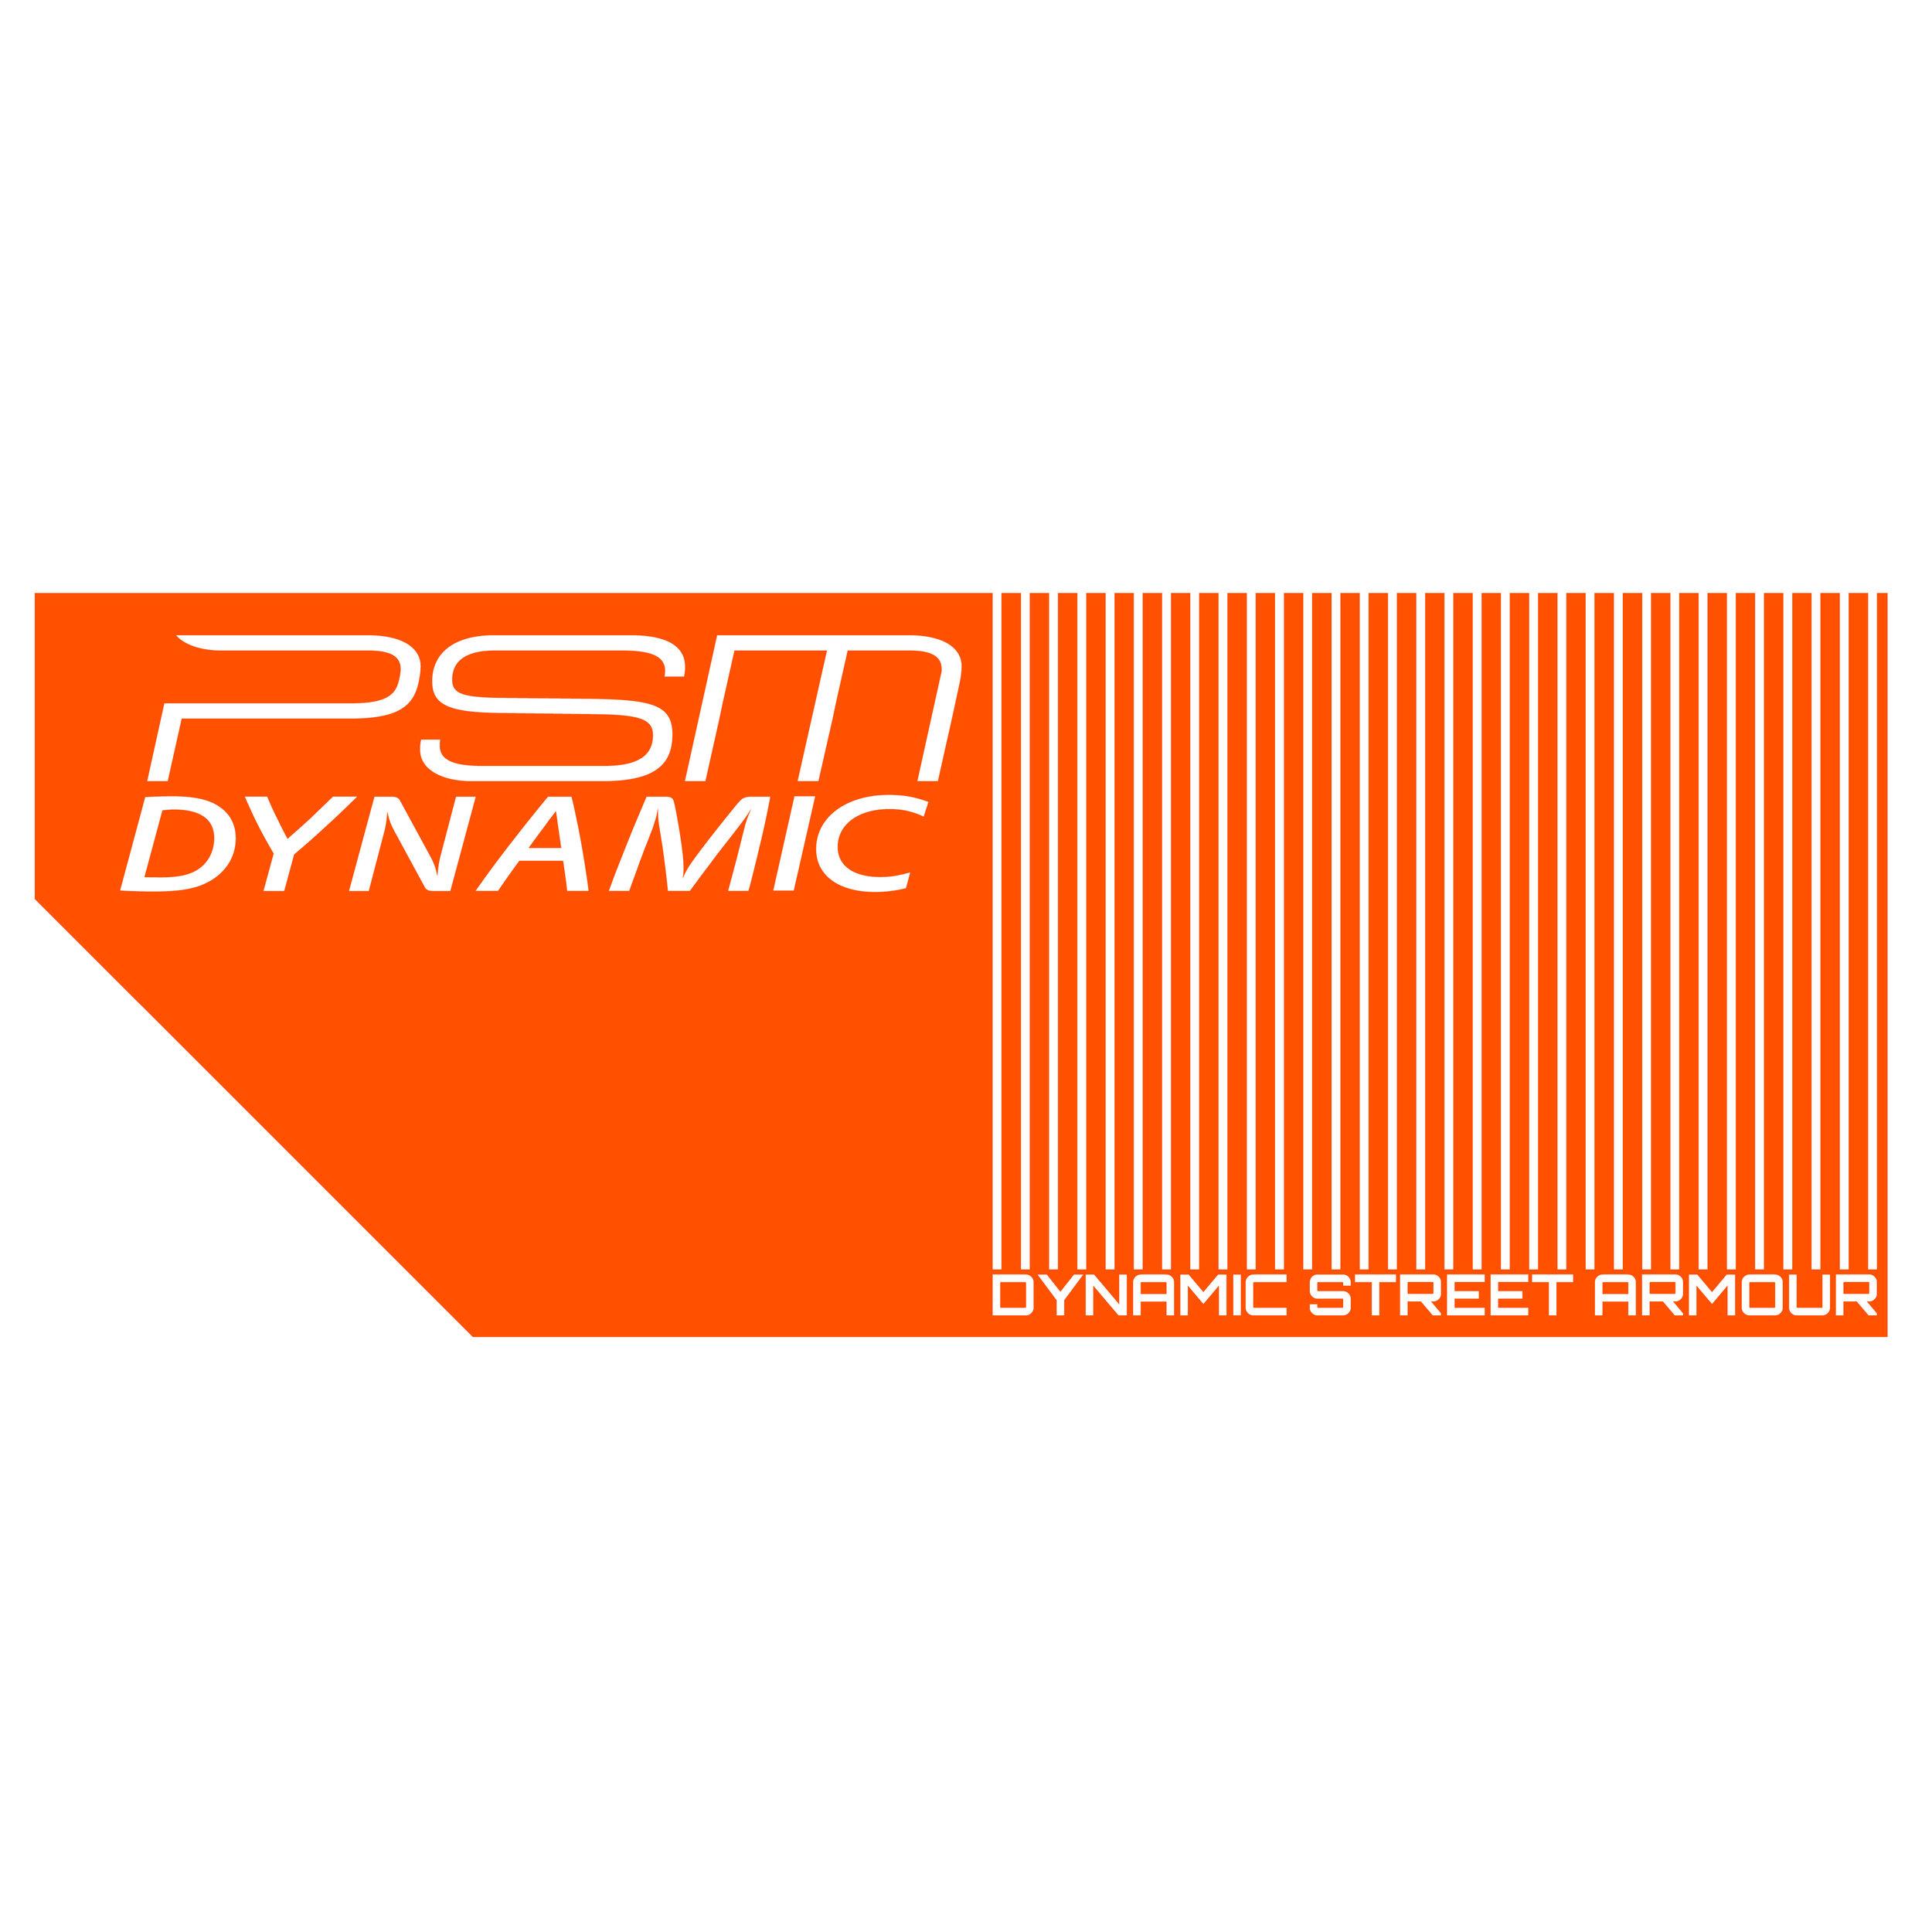 PSM WEB12.jpg